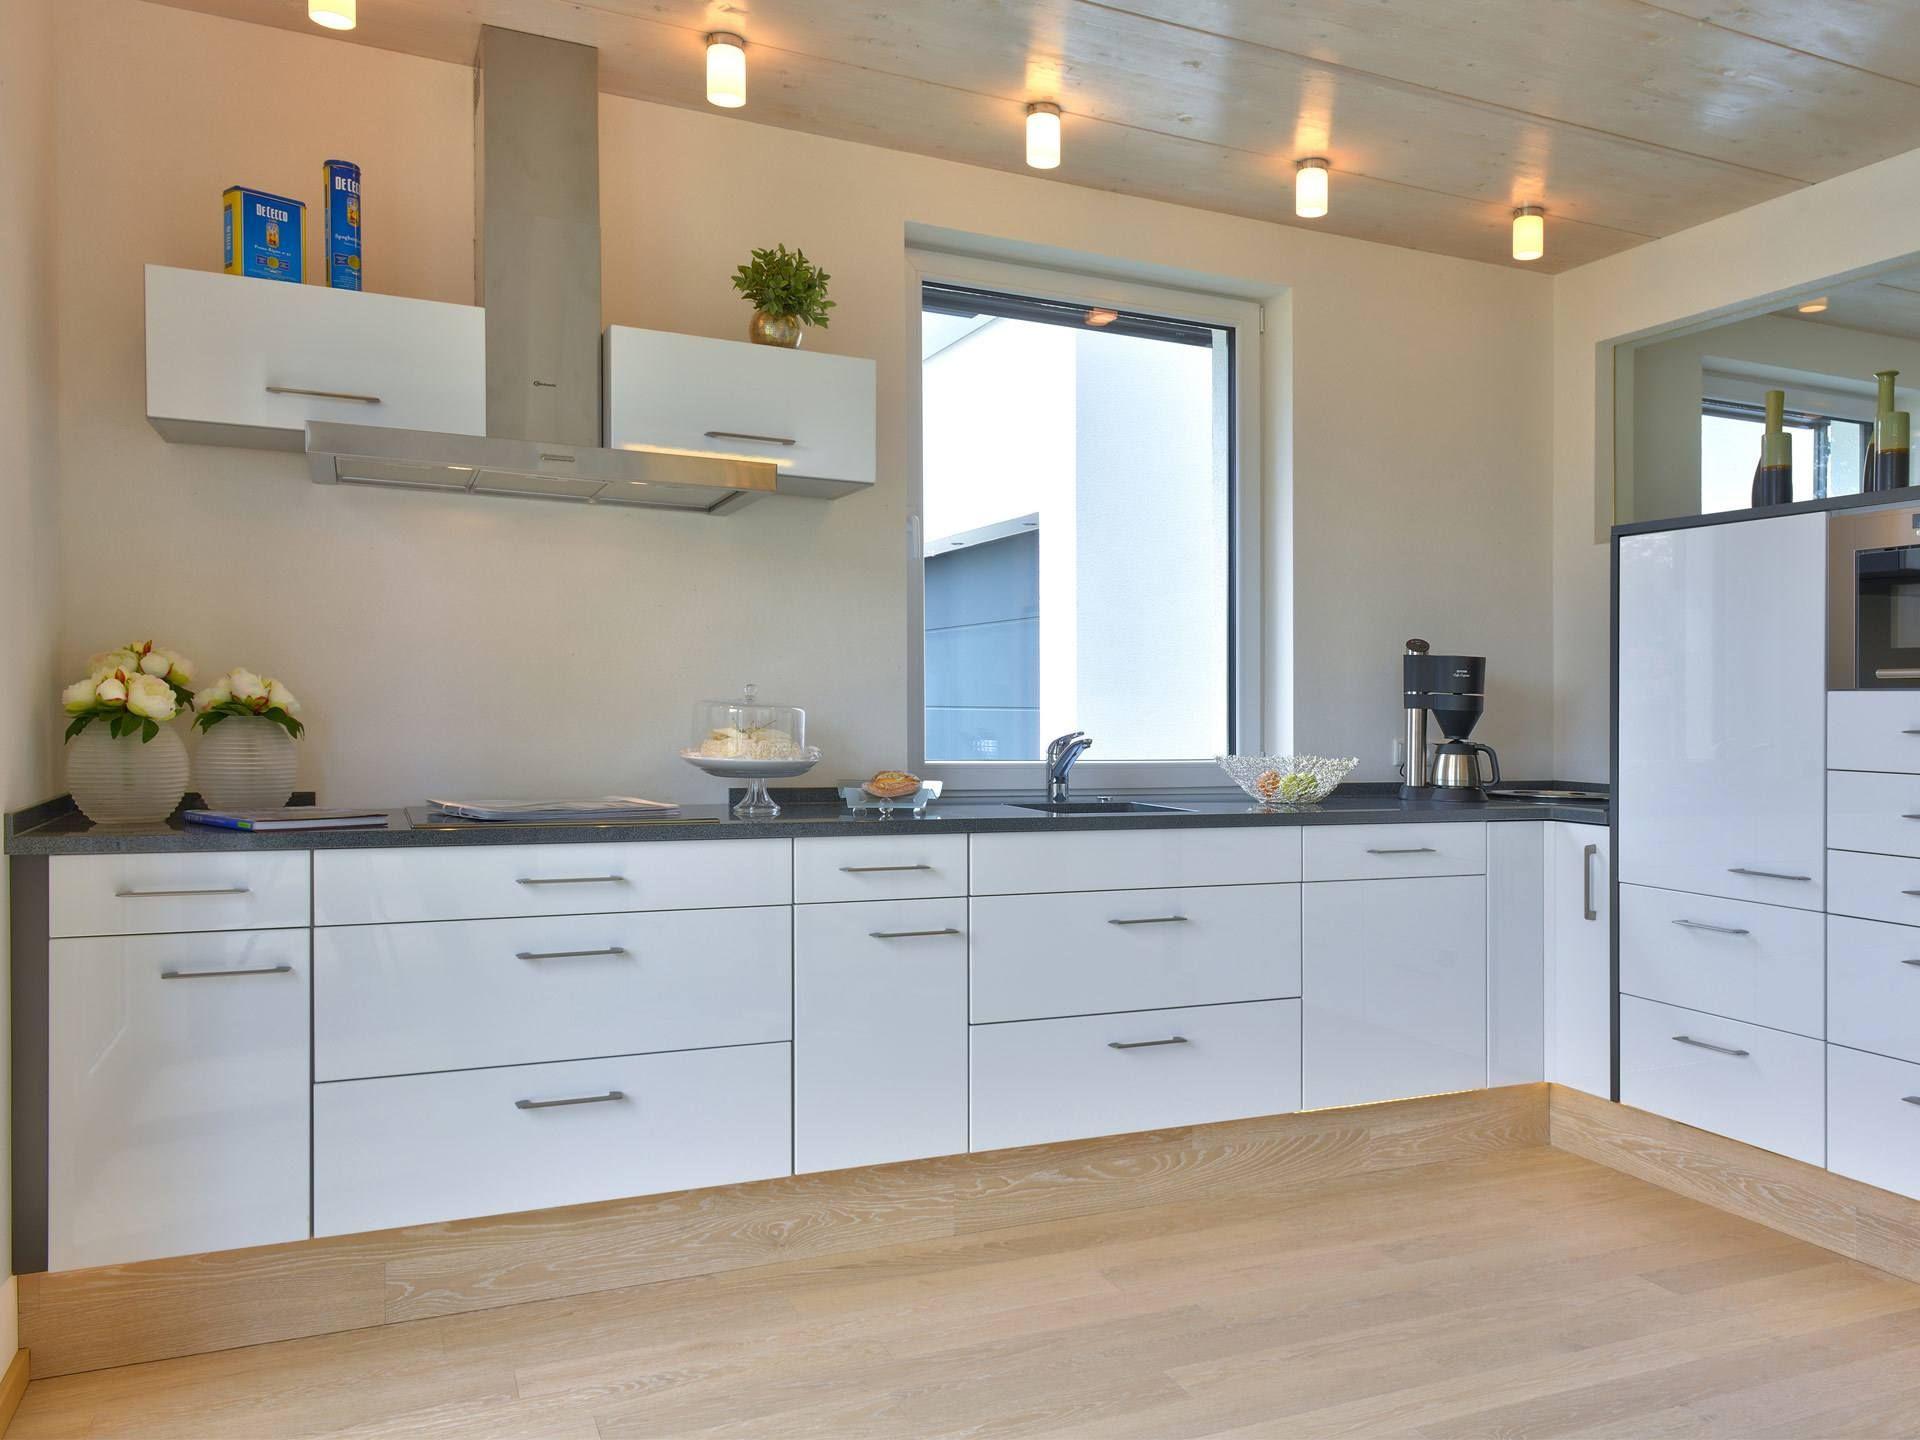 Held Küchenzeile ~ 43 best küche images on pinterest bauhaus benefits of and